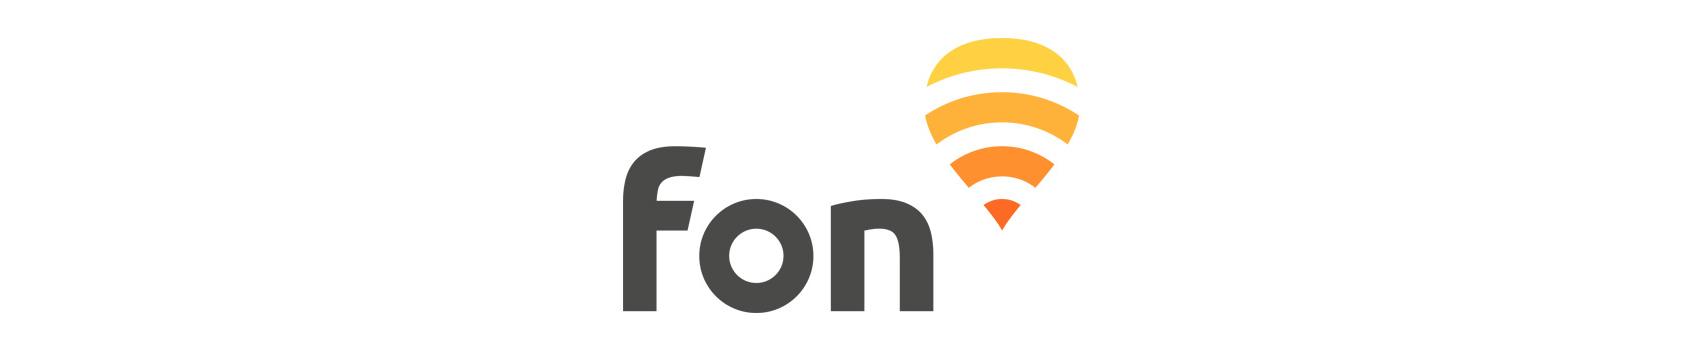 Blog Fon Logo Brand